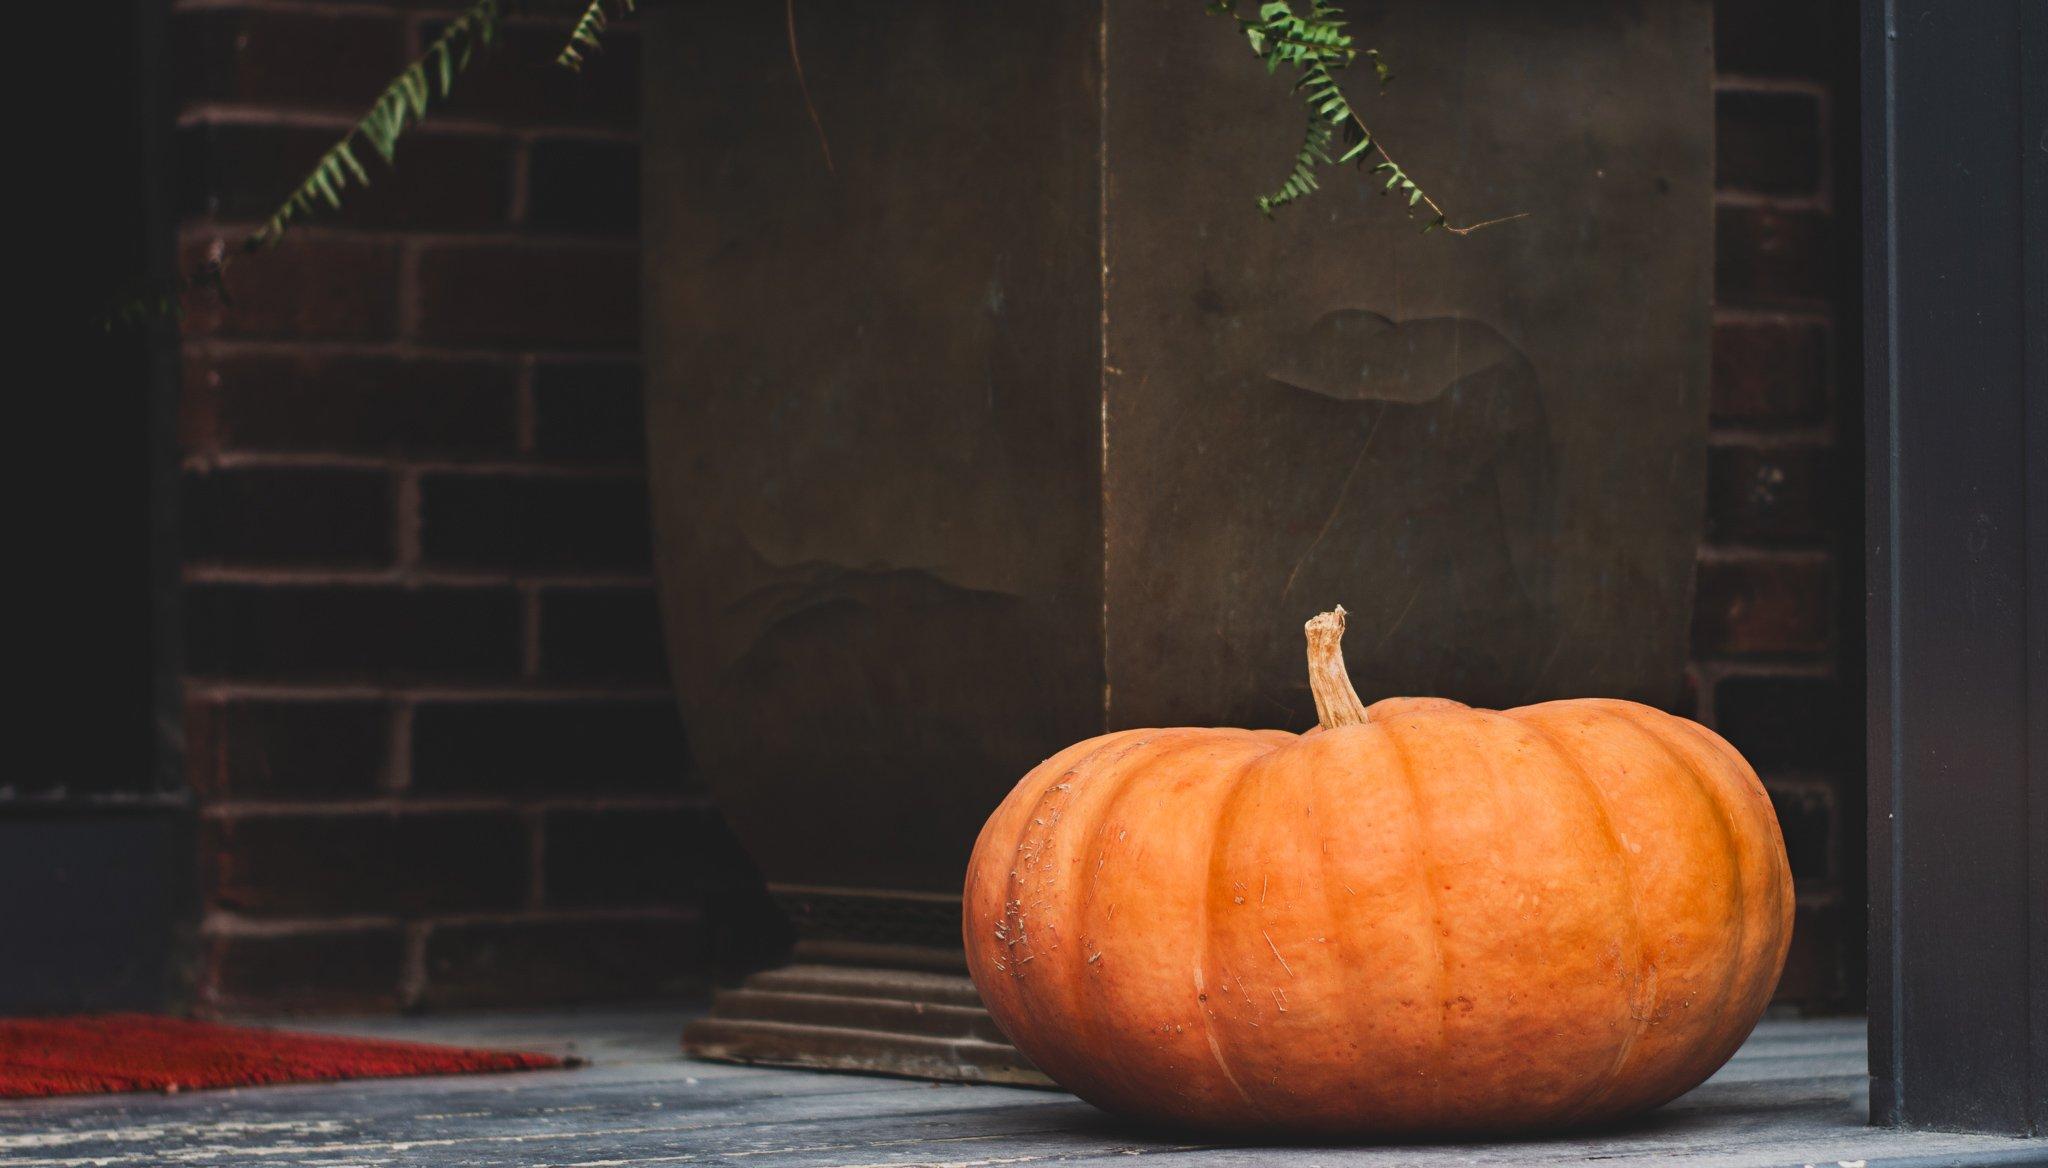 Photo of a Pumpkin on a Porch